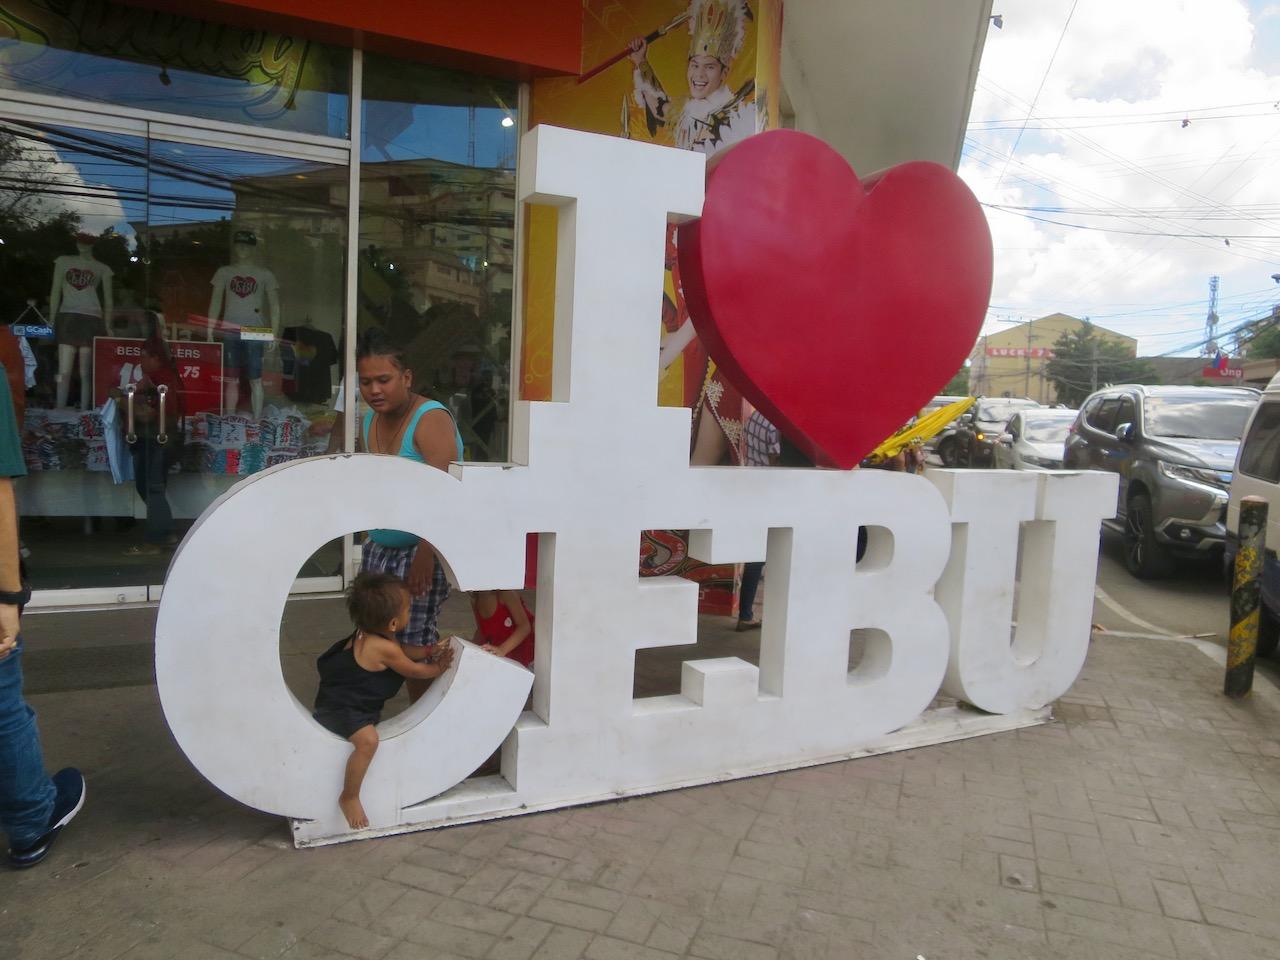 Sinal de Eu Amo Cebu